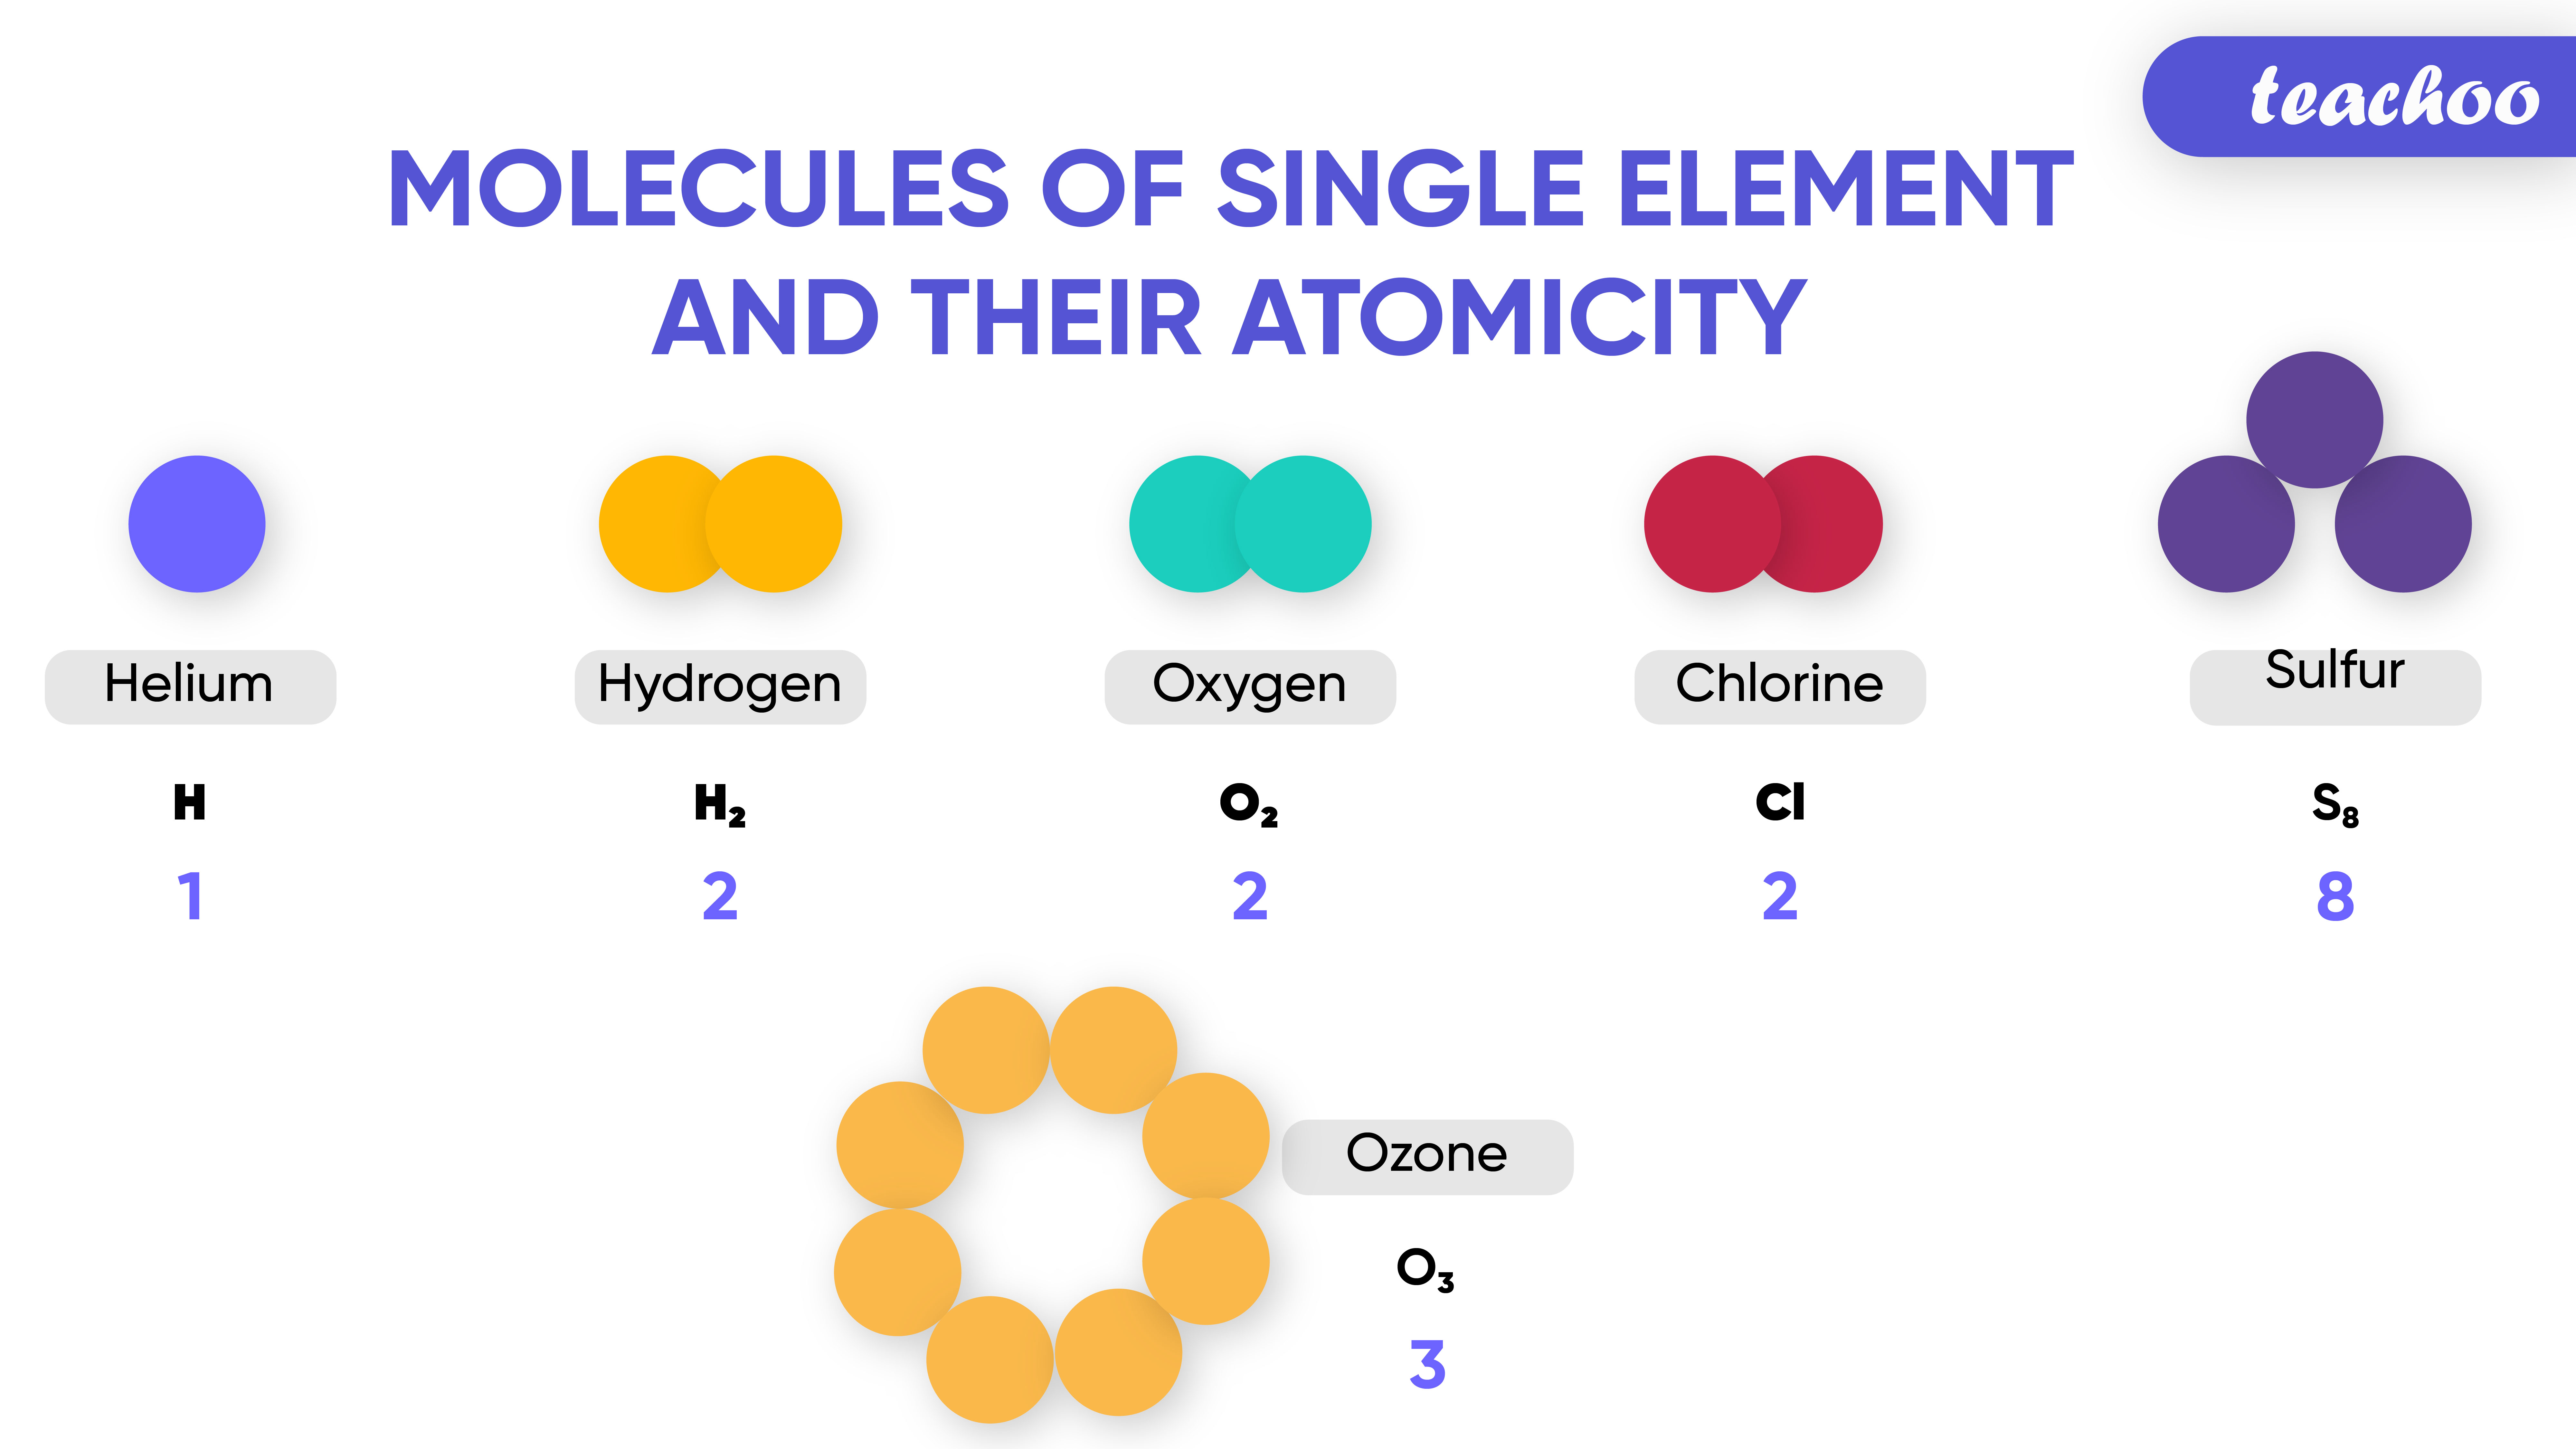 Molecules of single element and their atomicity-Teachoo-01.jpg